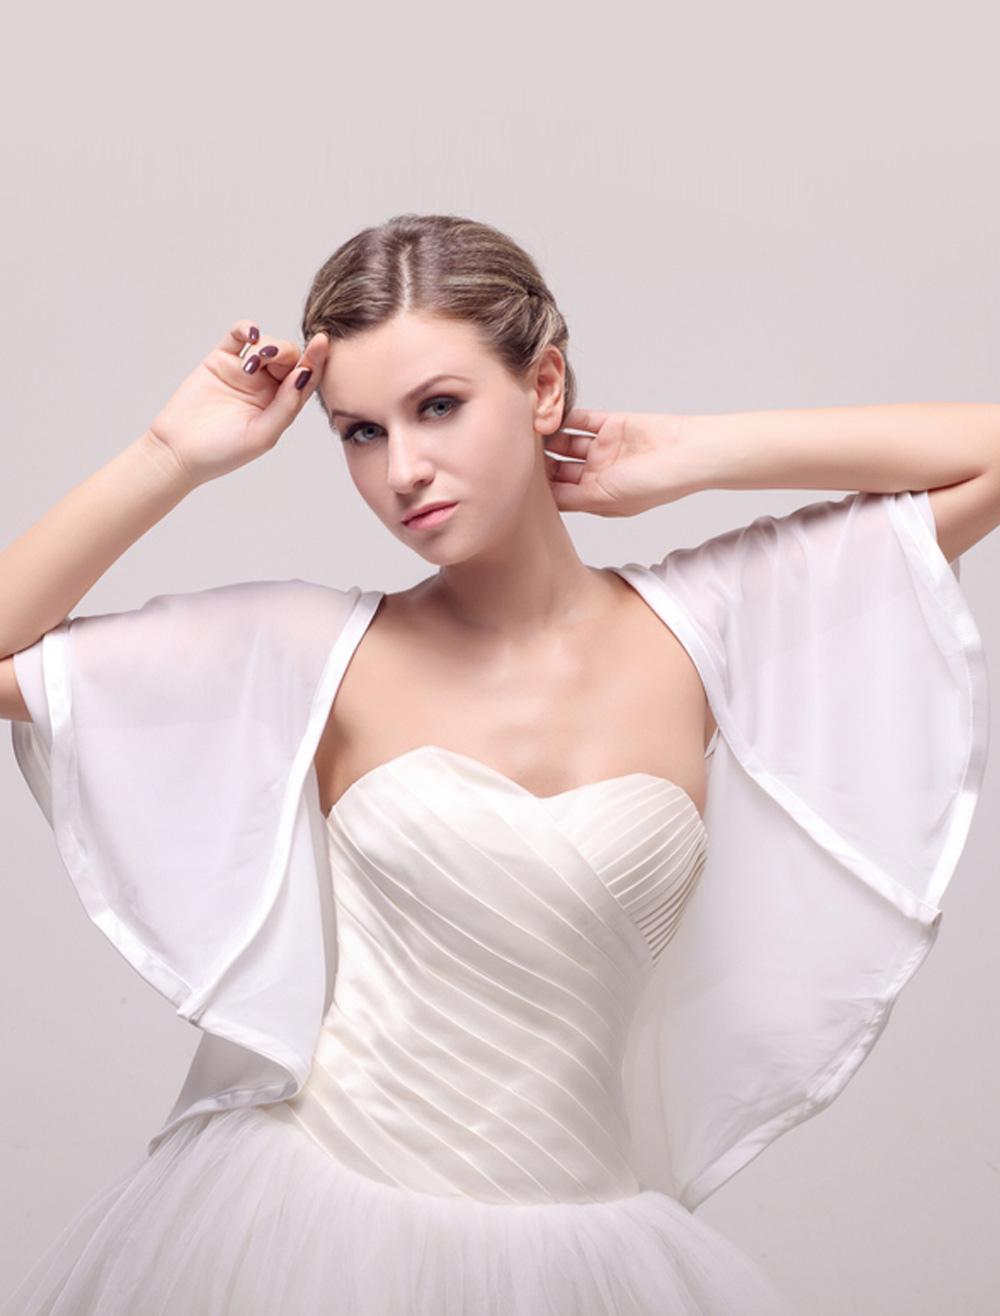 Half Sleeve Chiffon Coverup for Bride